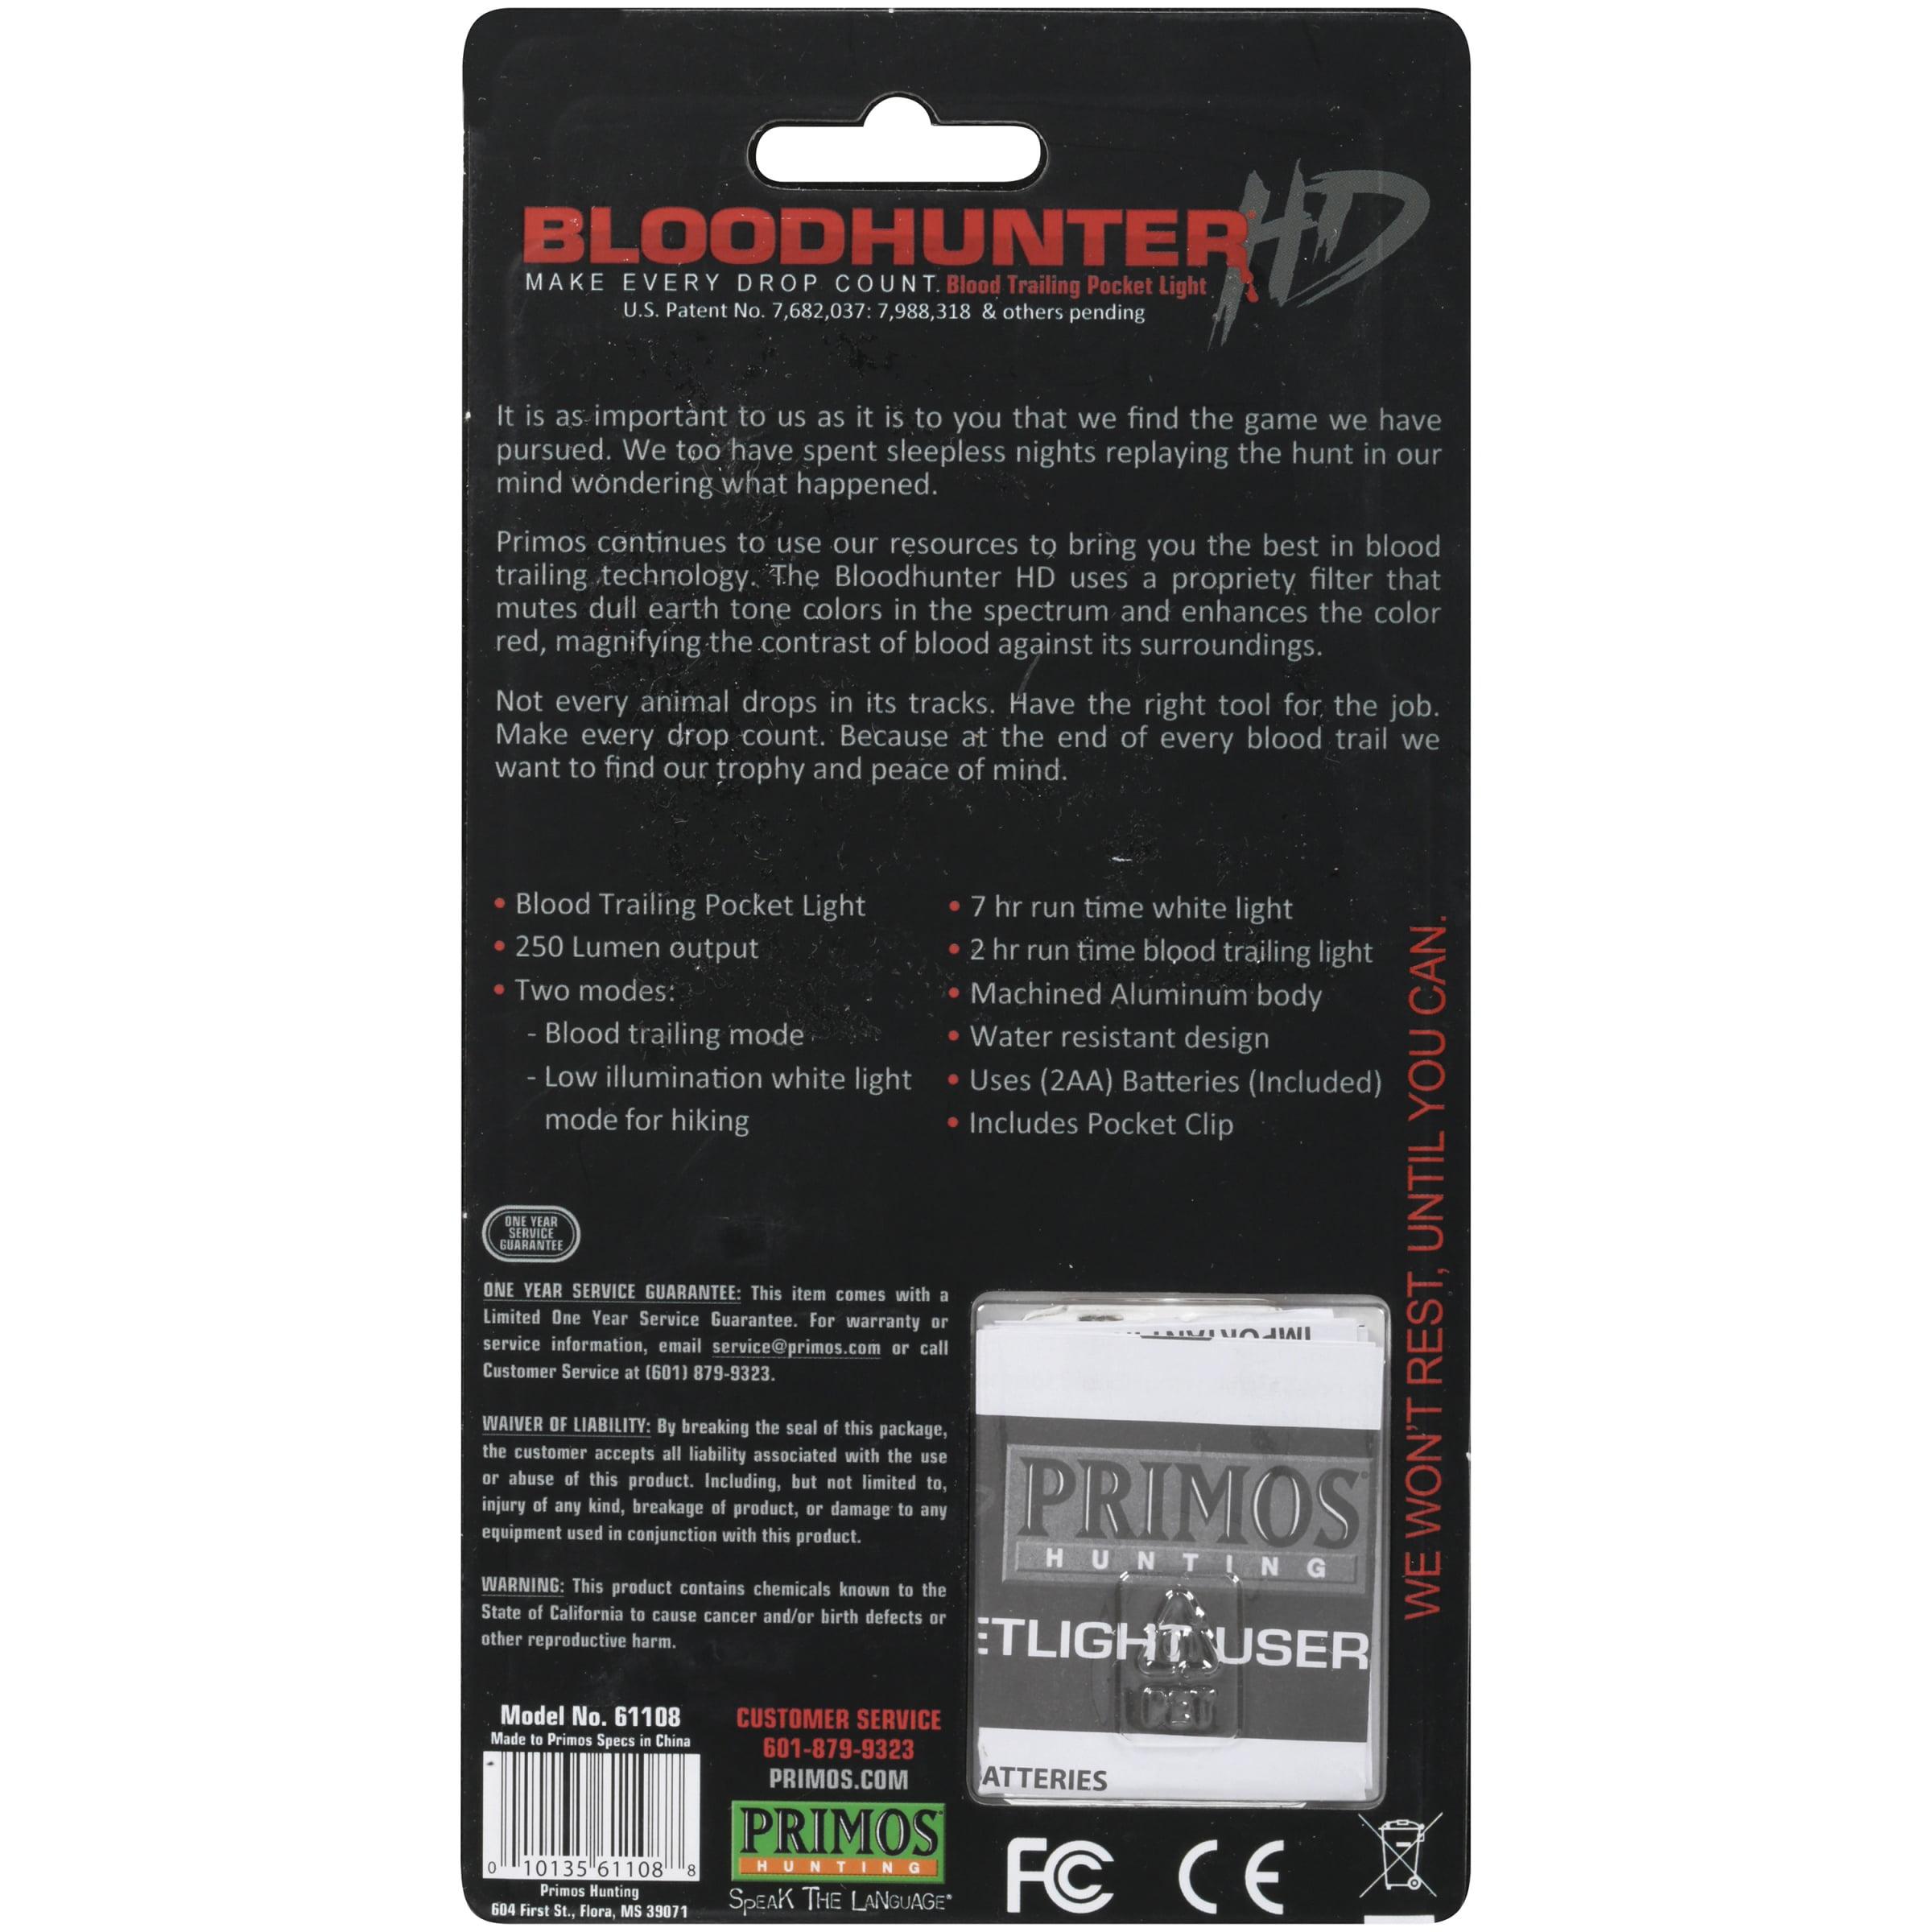 Primos 61108 Bloodhunter HD Pocket Light